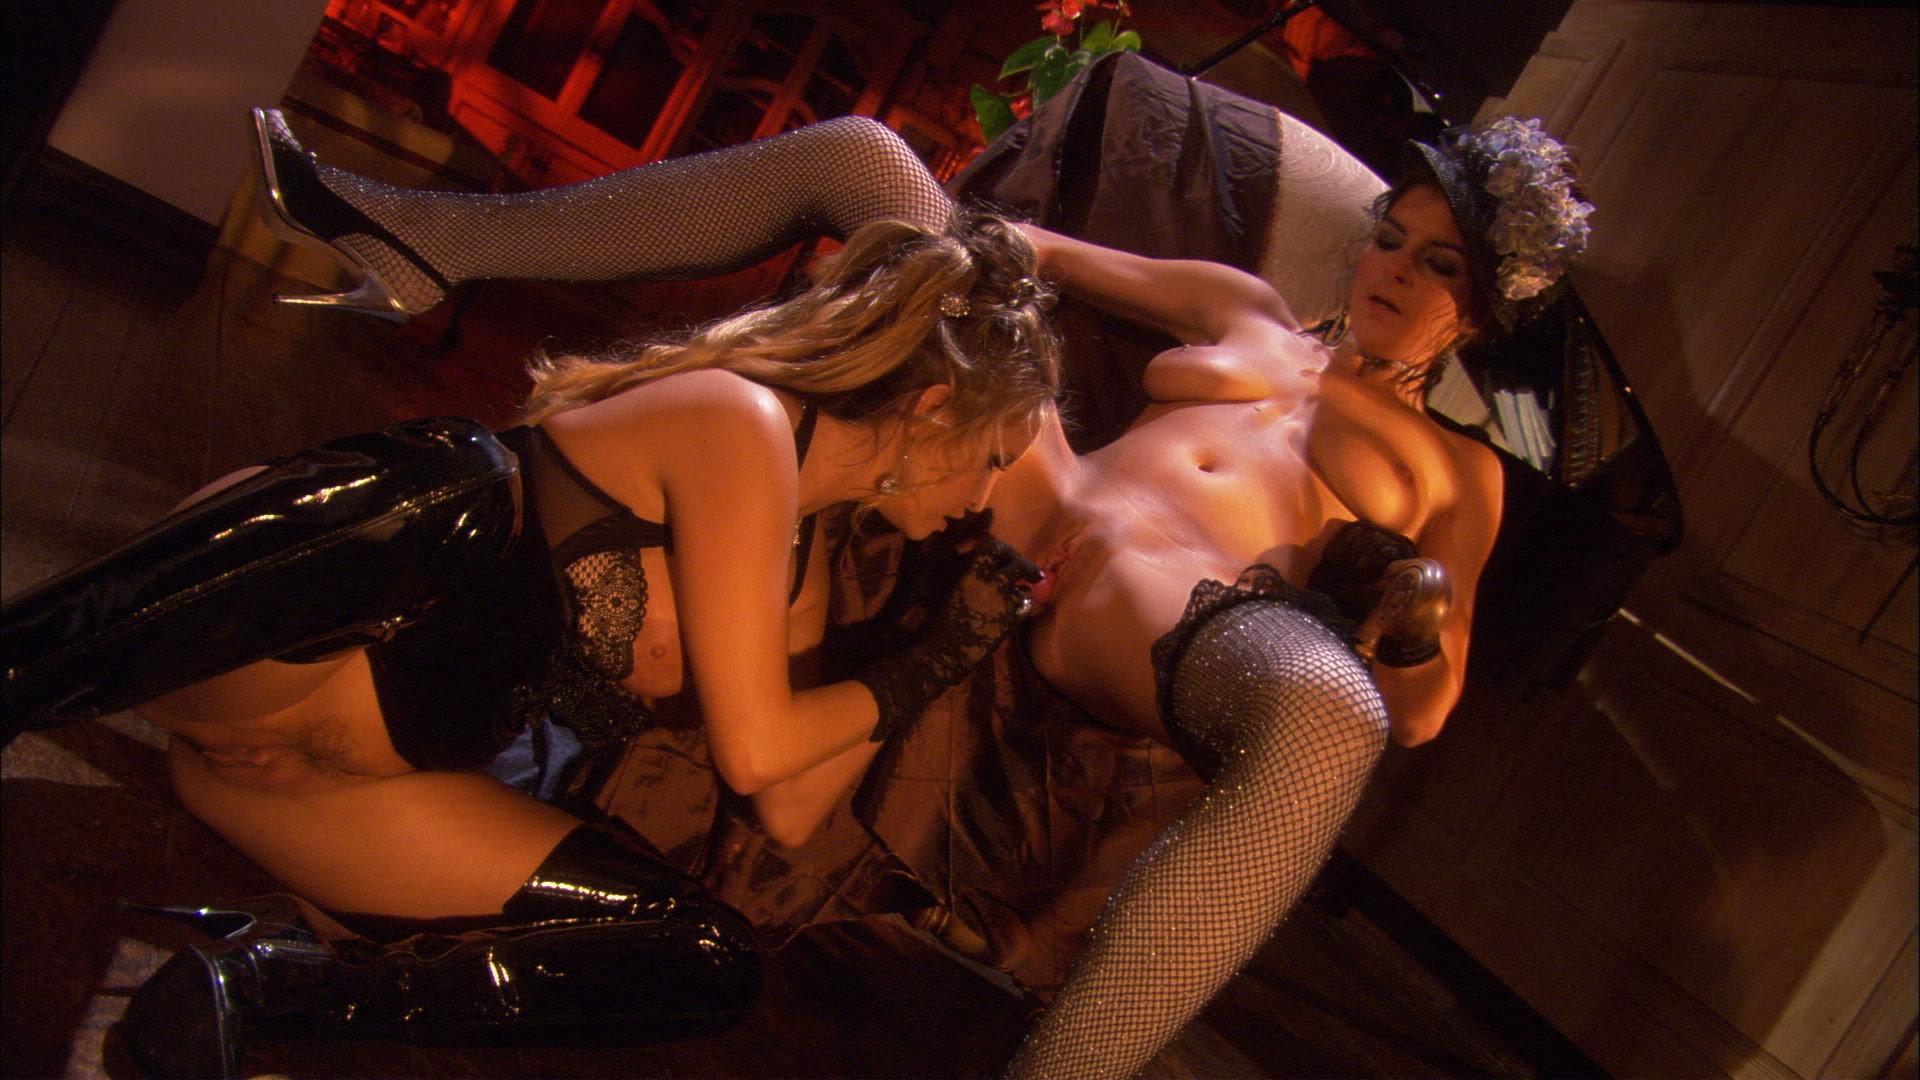 Morgana Dark's Lesbian Fantasies